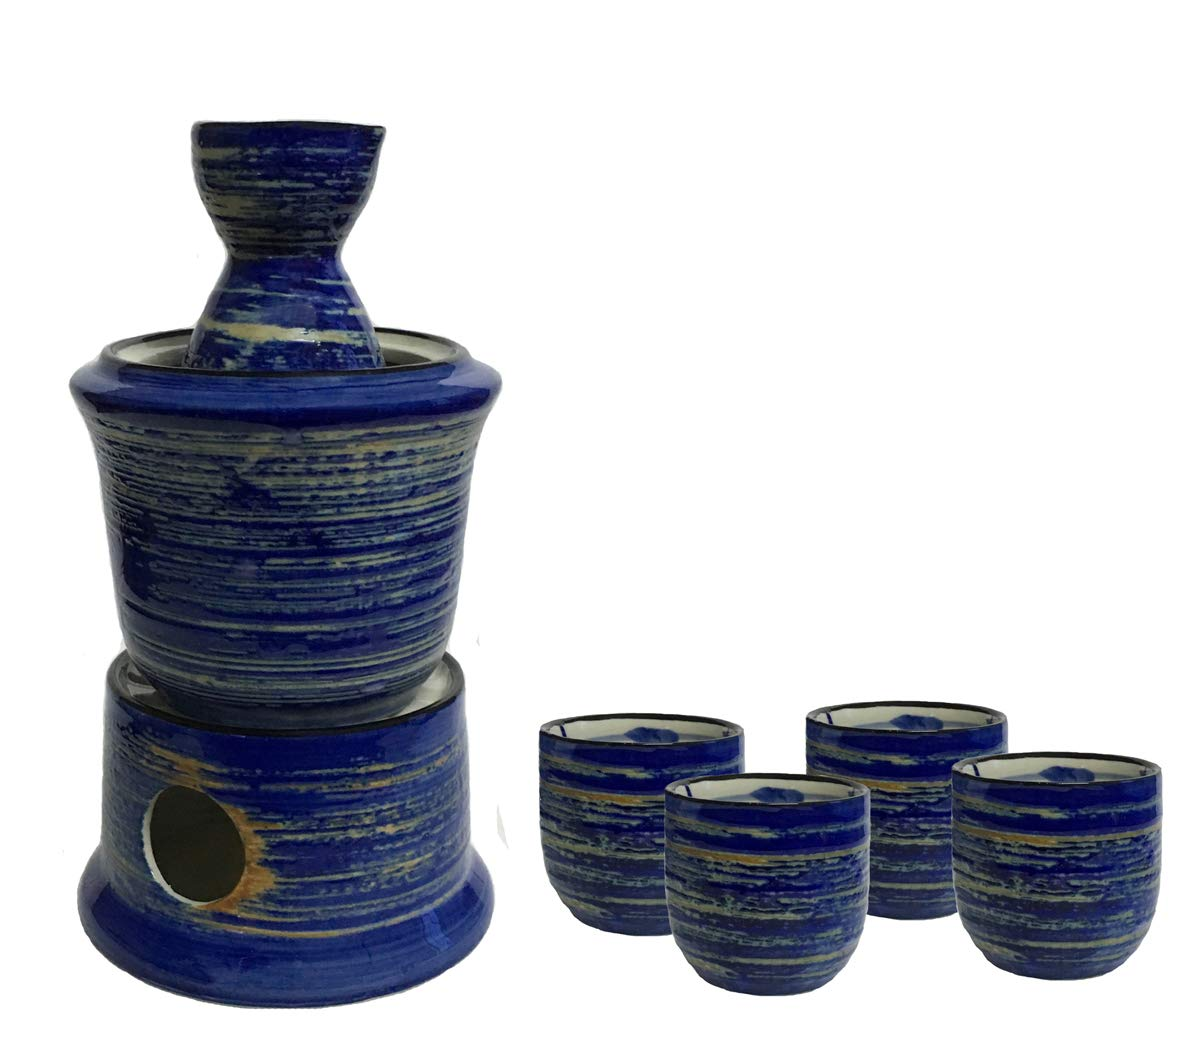 KCHAIN Ceramic Sake Warmer Set with 4pc Sake Cups, 1pc Sake Bottle, 1pc Warmer Pot, 1pc Heating Pot by KCHAIN